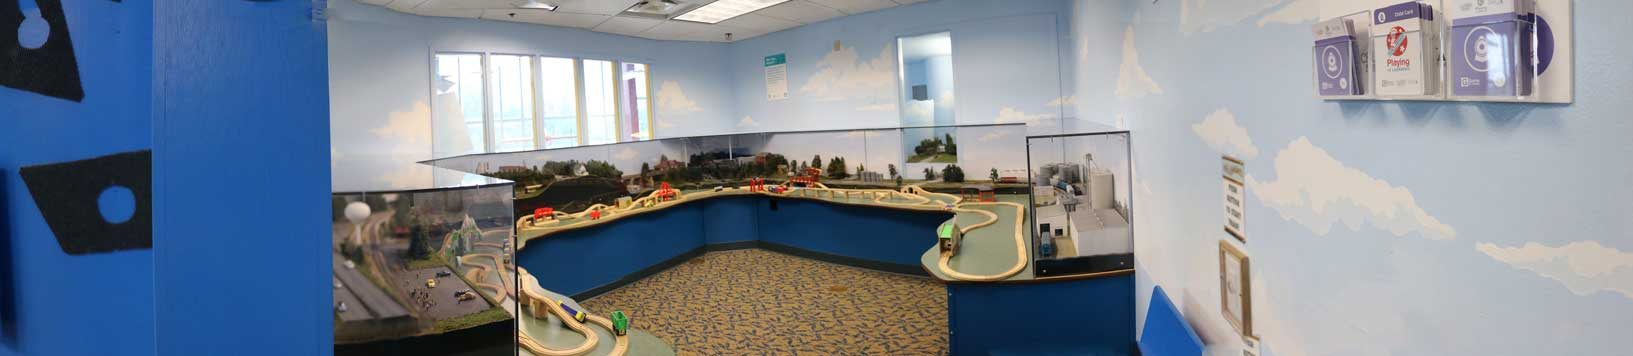 Train-Room-Panorama